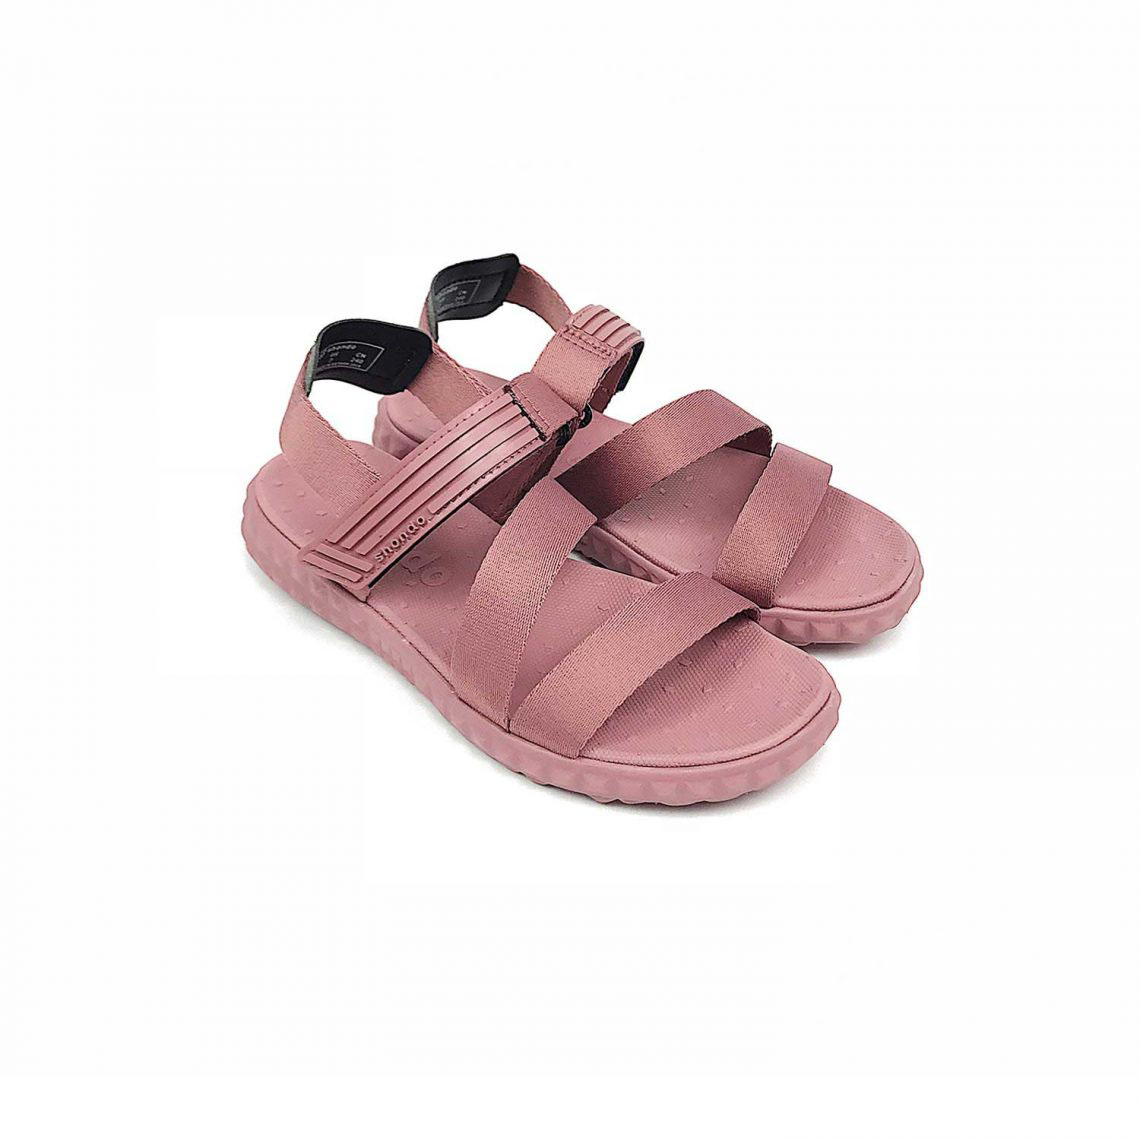 Giày Sandals SHONDO F6 F6M203 4